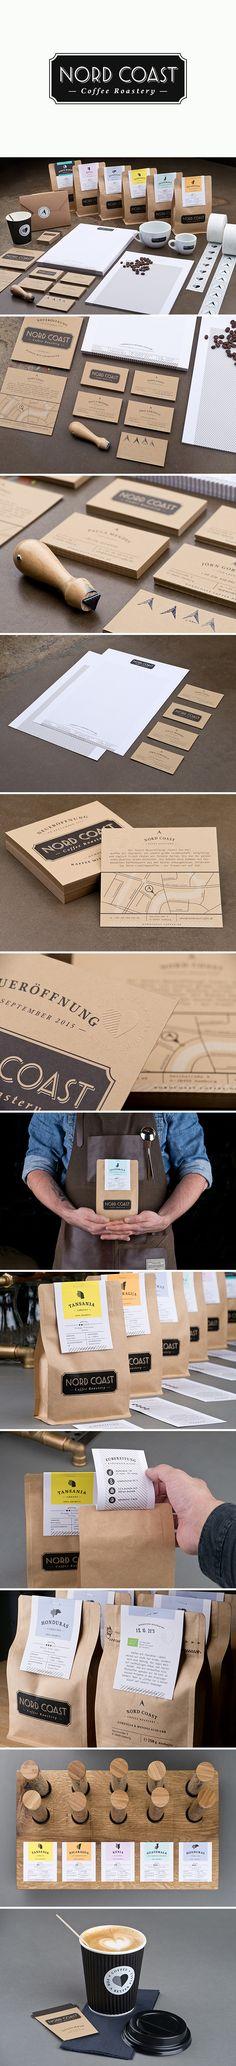 Nord Coast Coffee Roastery by Phound Design Studio